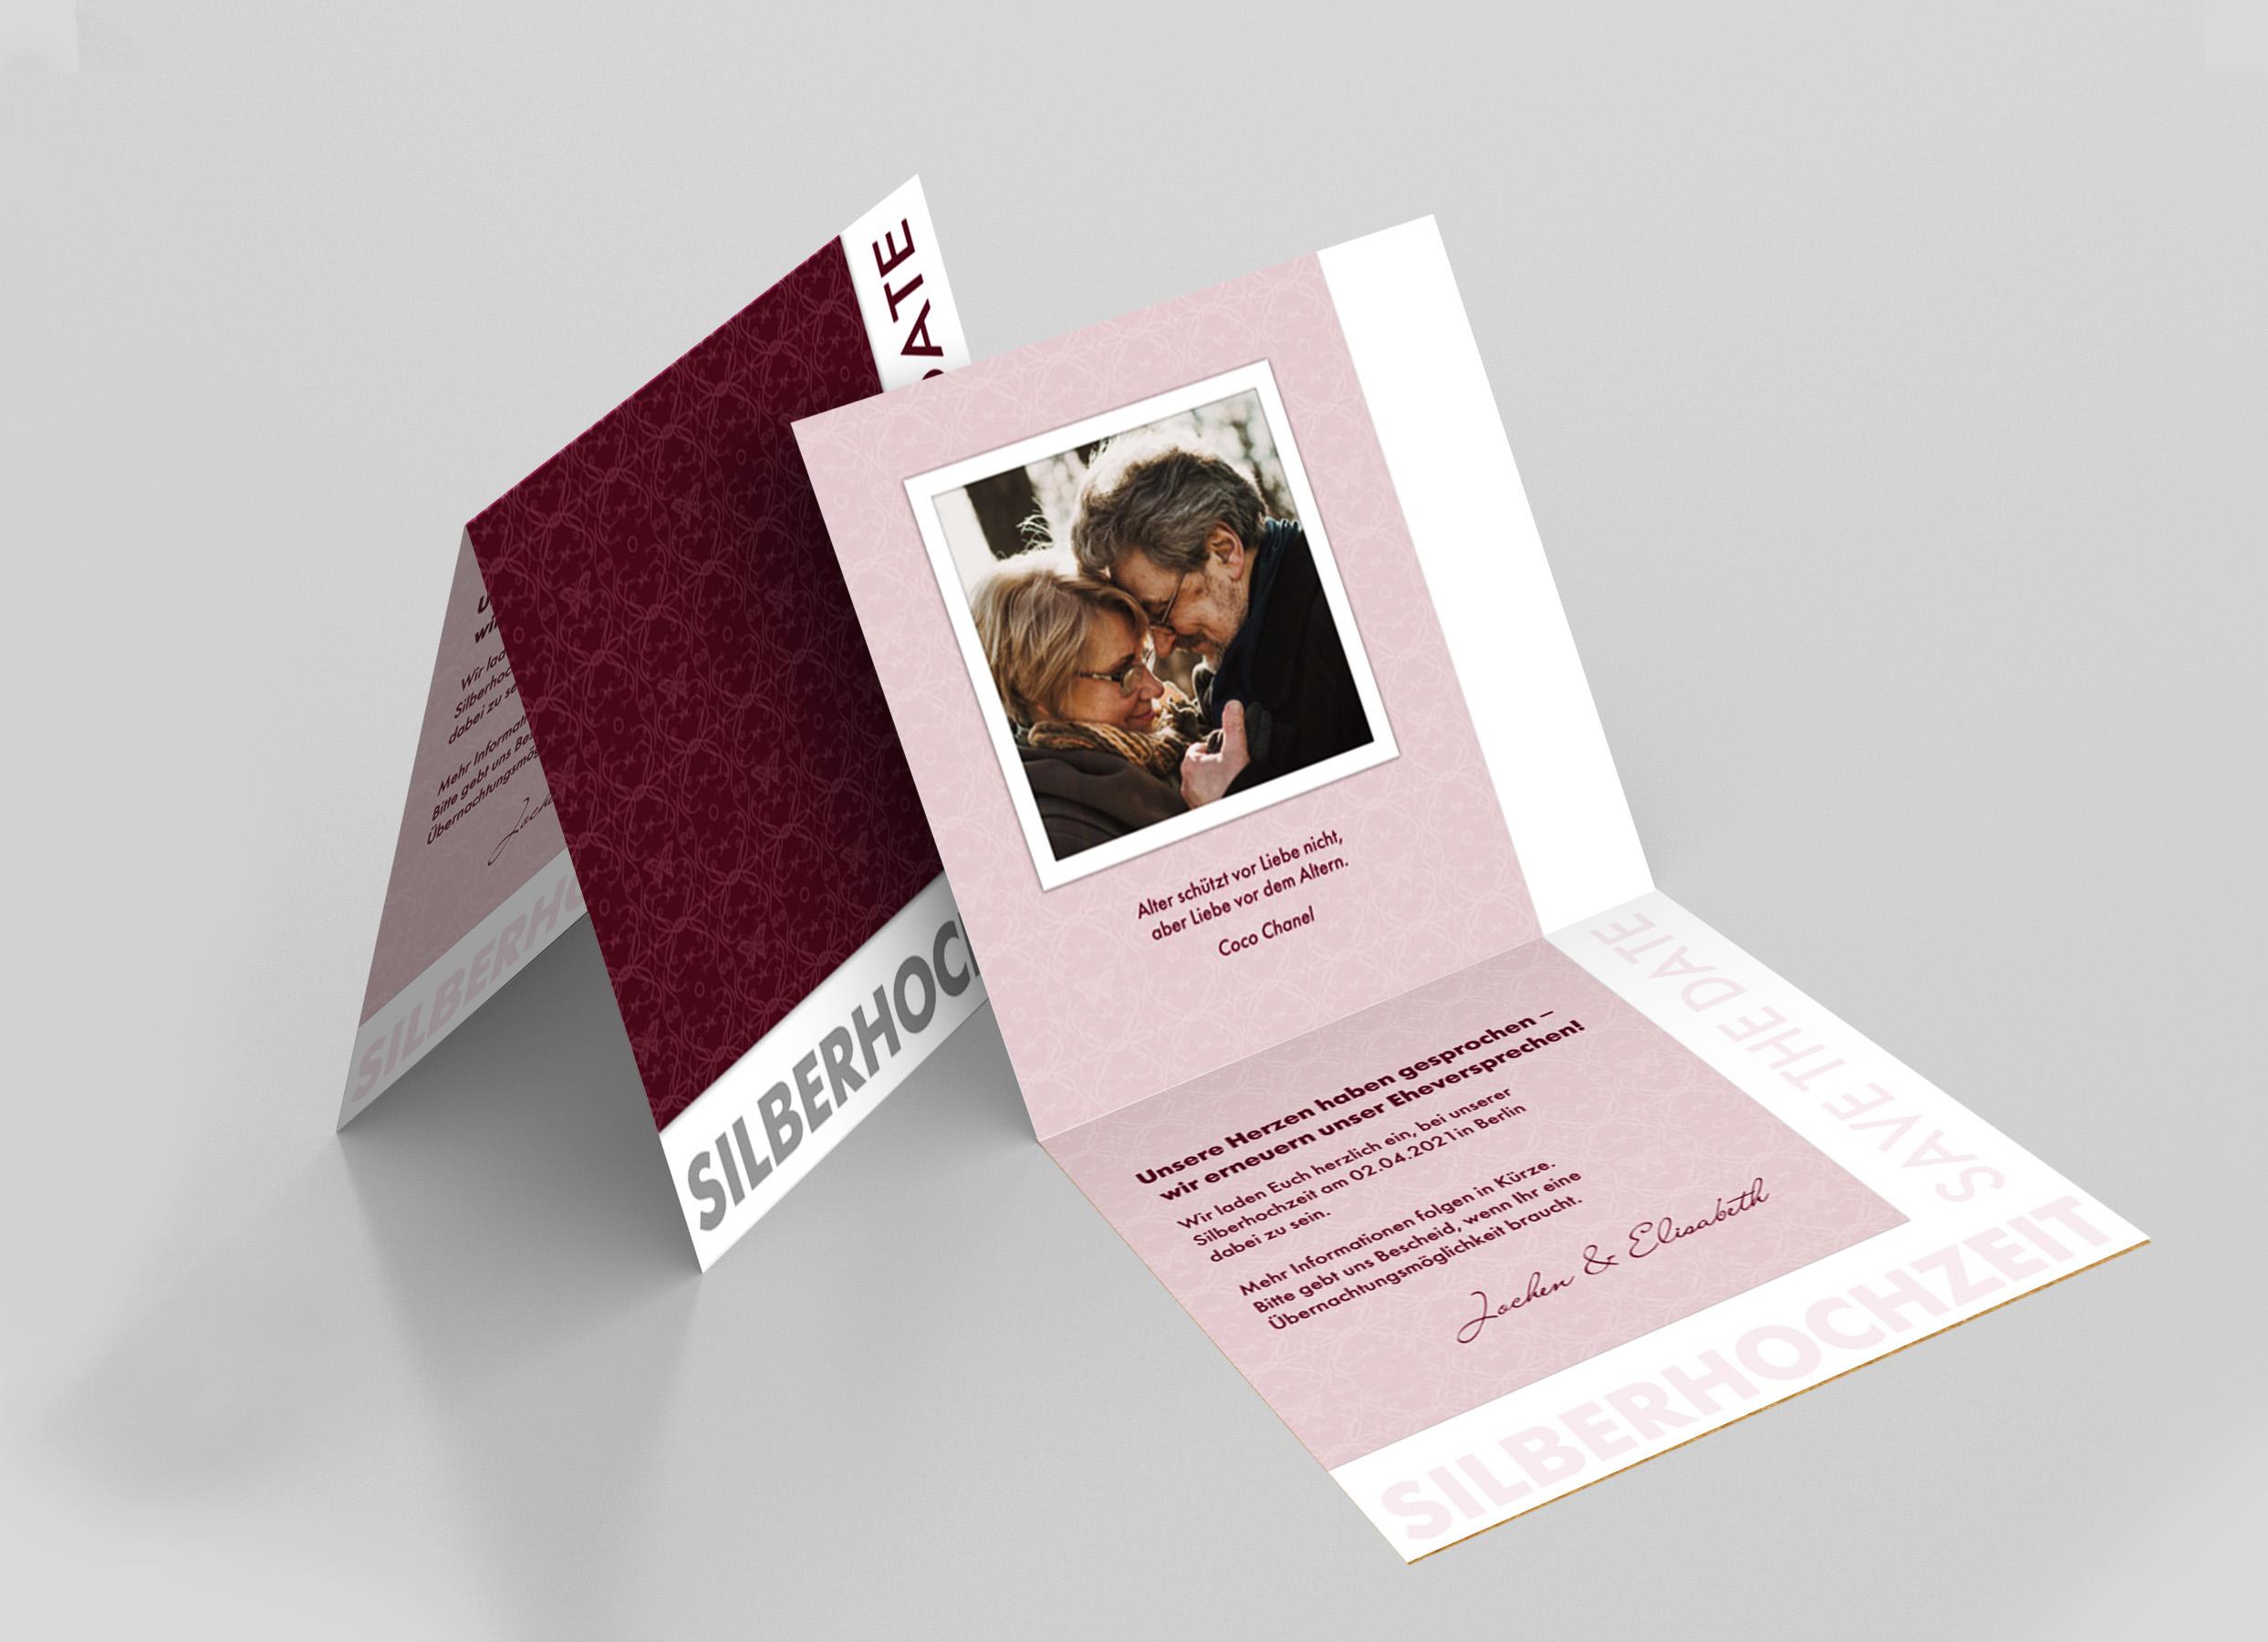 Save the Date Karte Silberhochzeit Schmetterlingsornamente